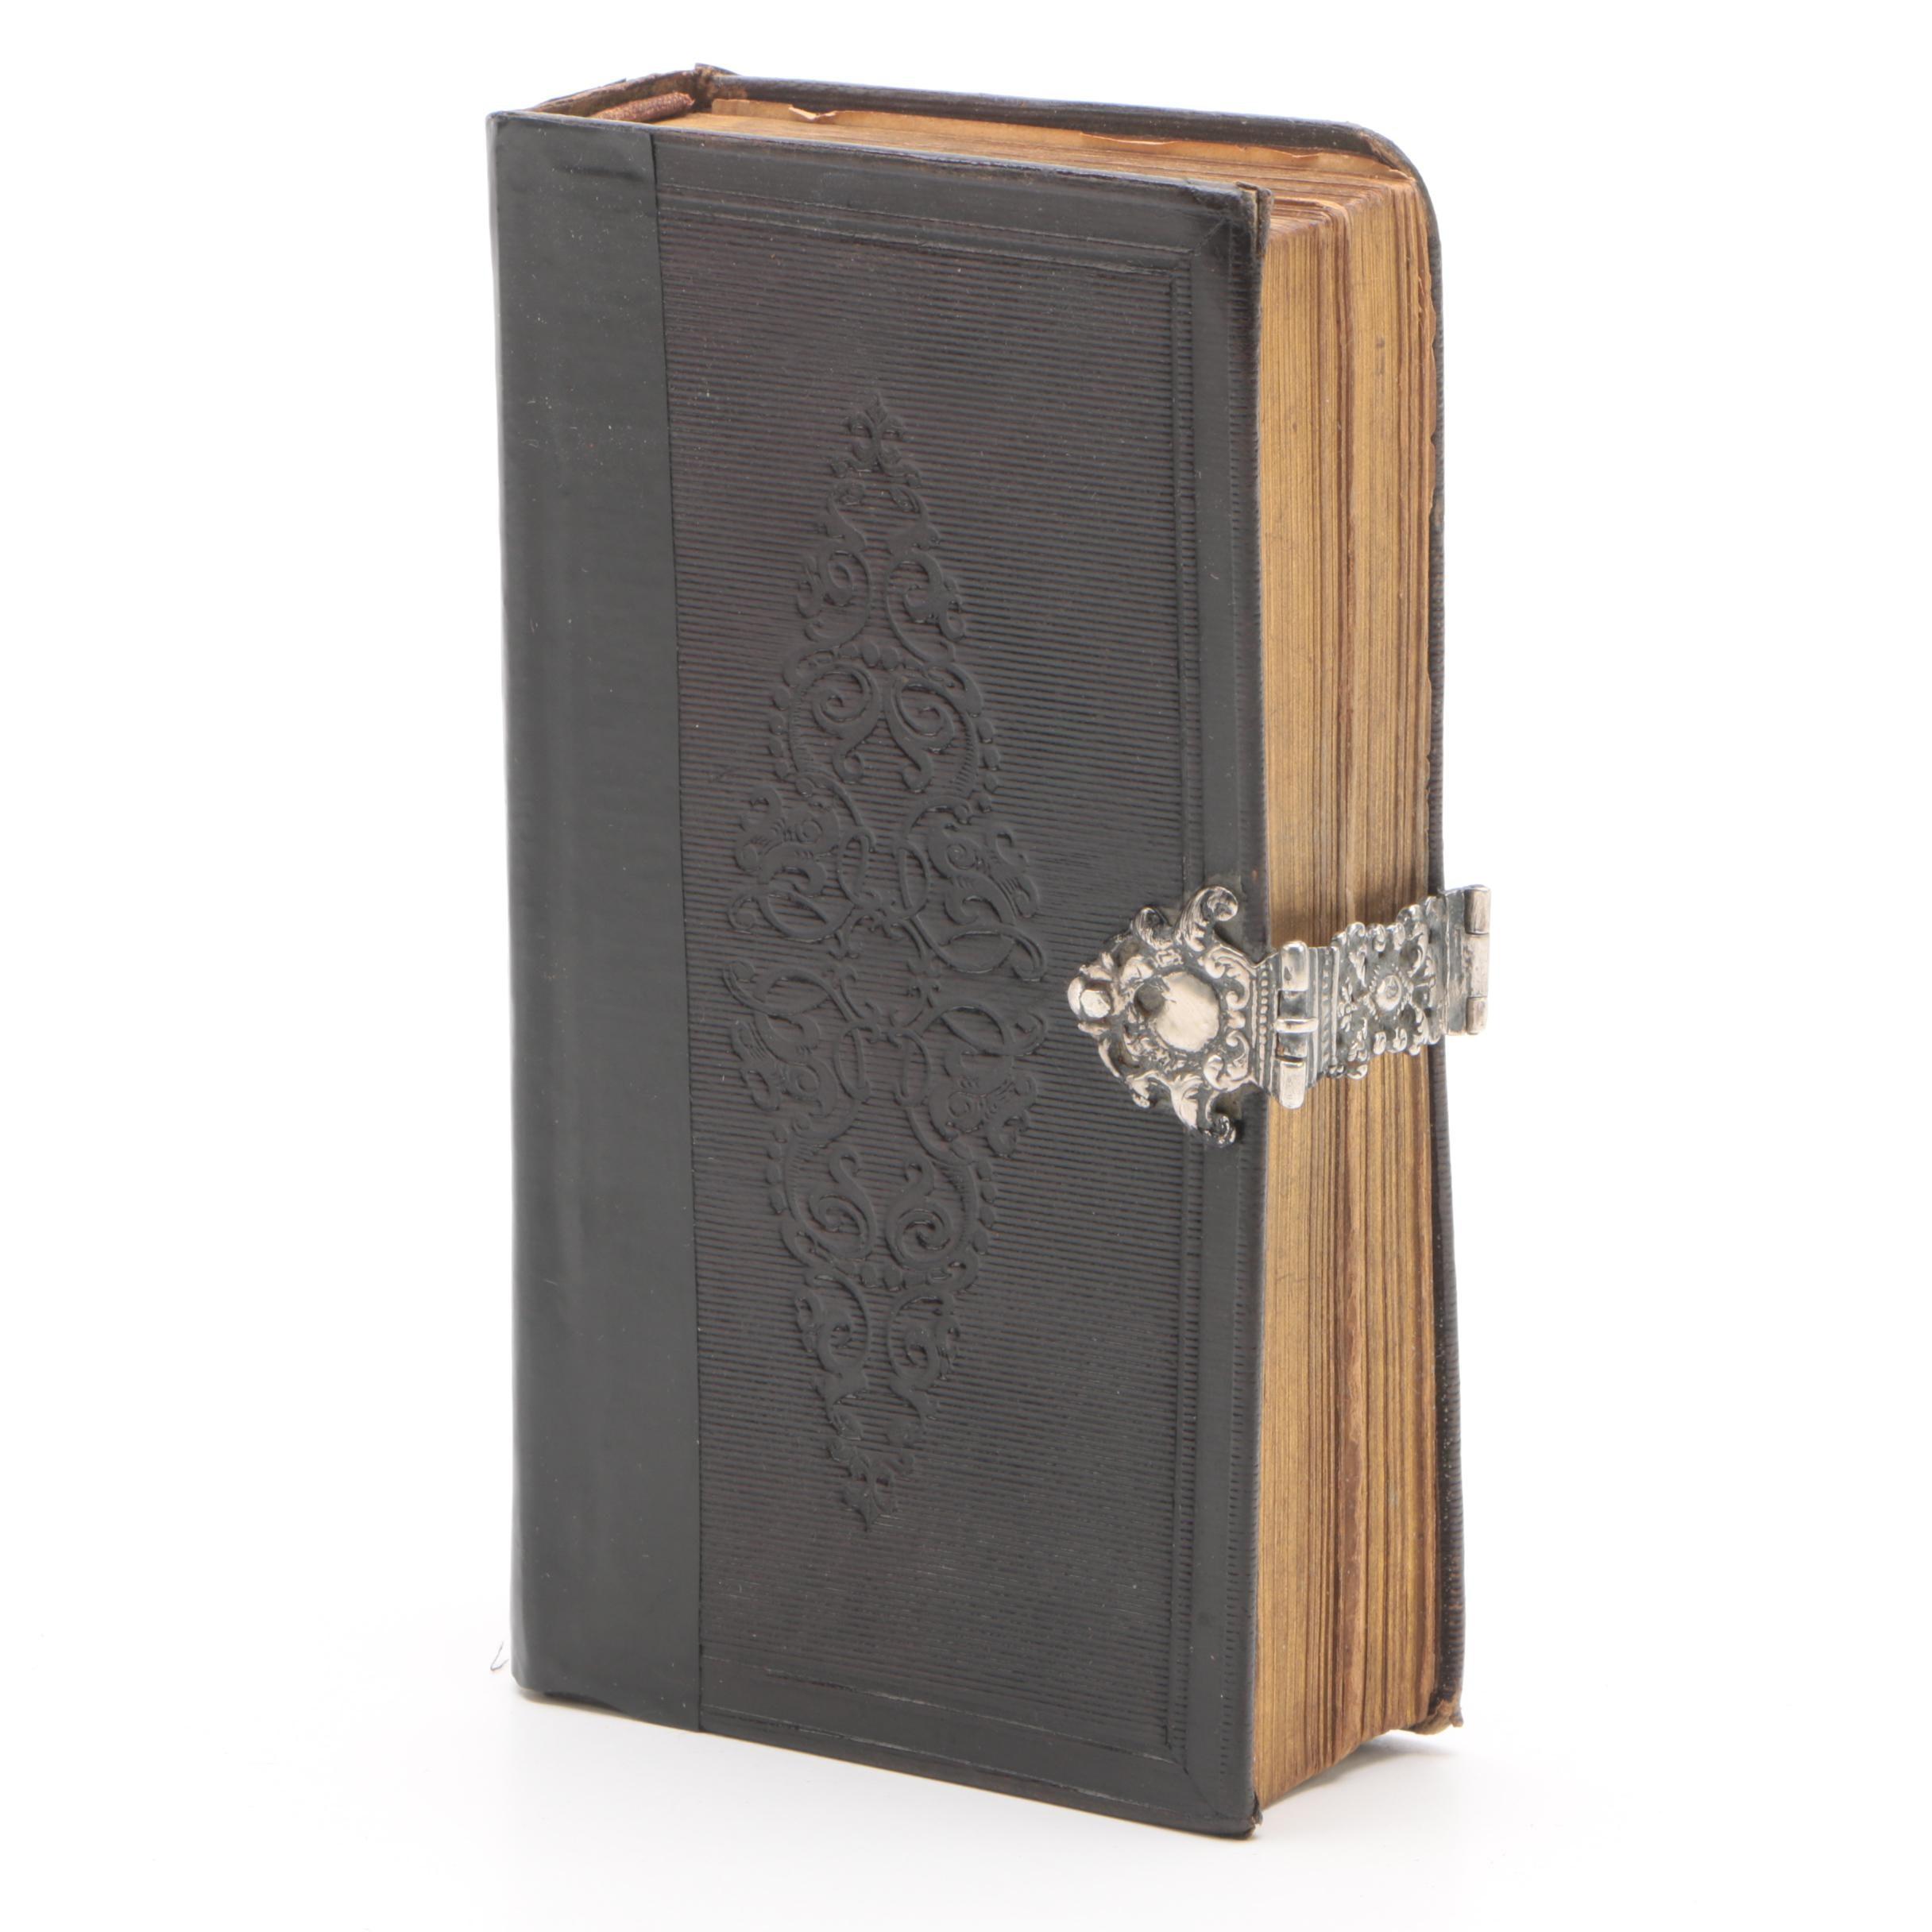 1870 Dutch-Language New Testament Bible